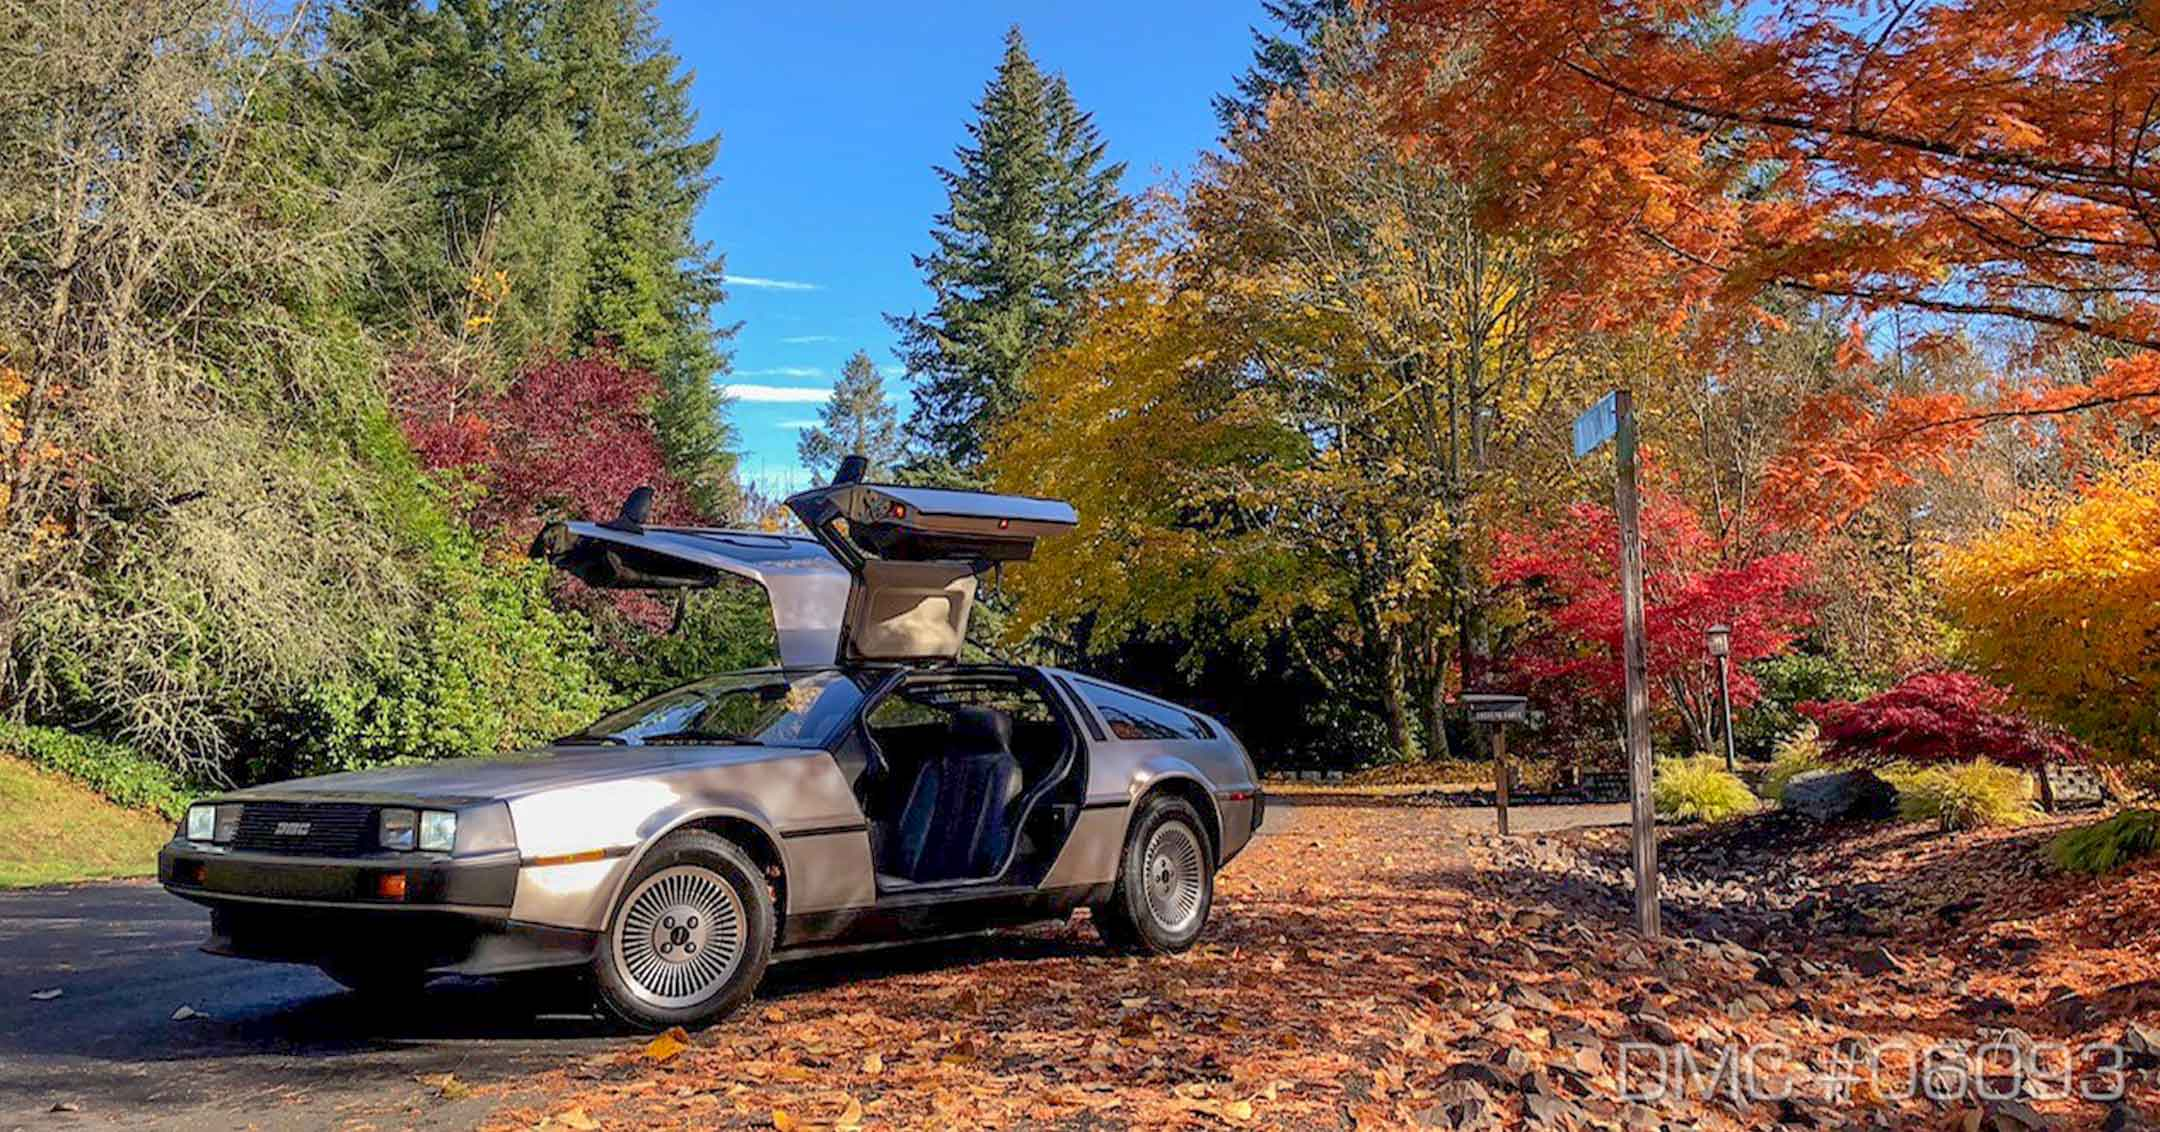 SCEDT26T7BD006093 | DeLoreanDirectory.com